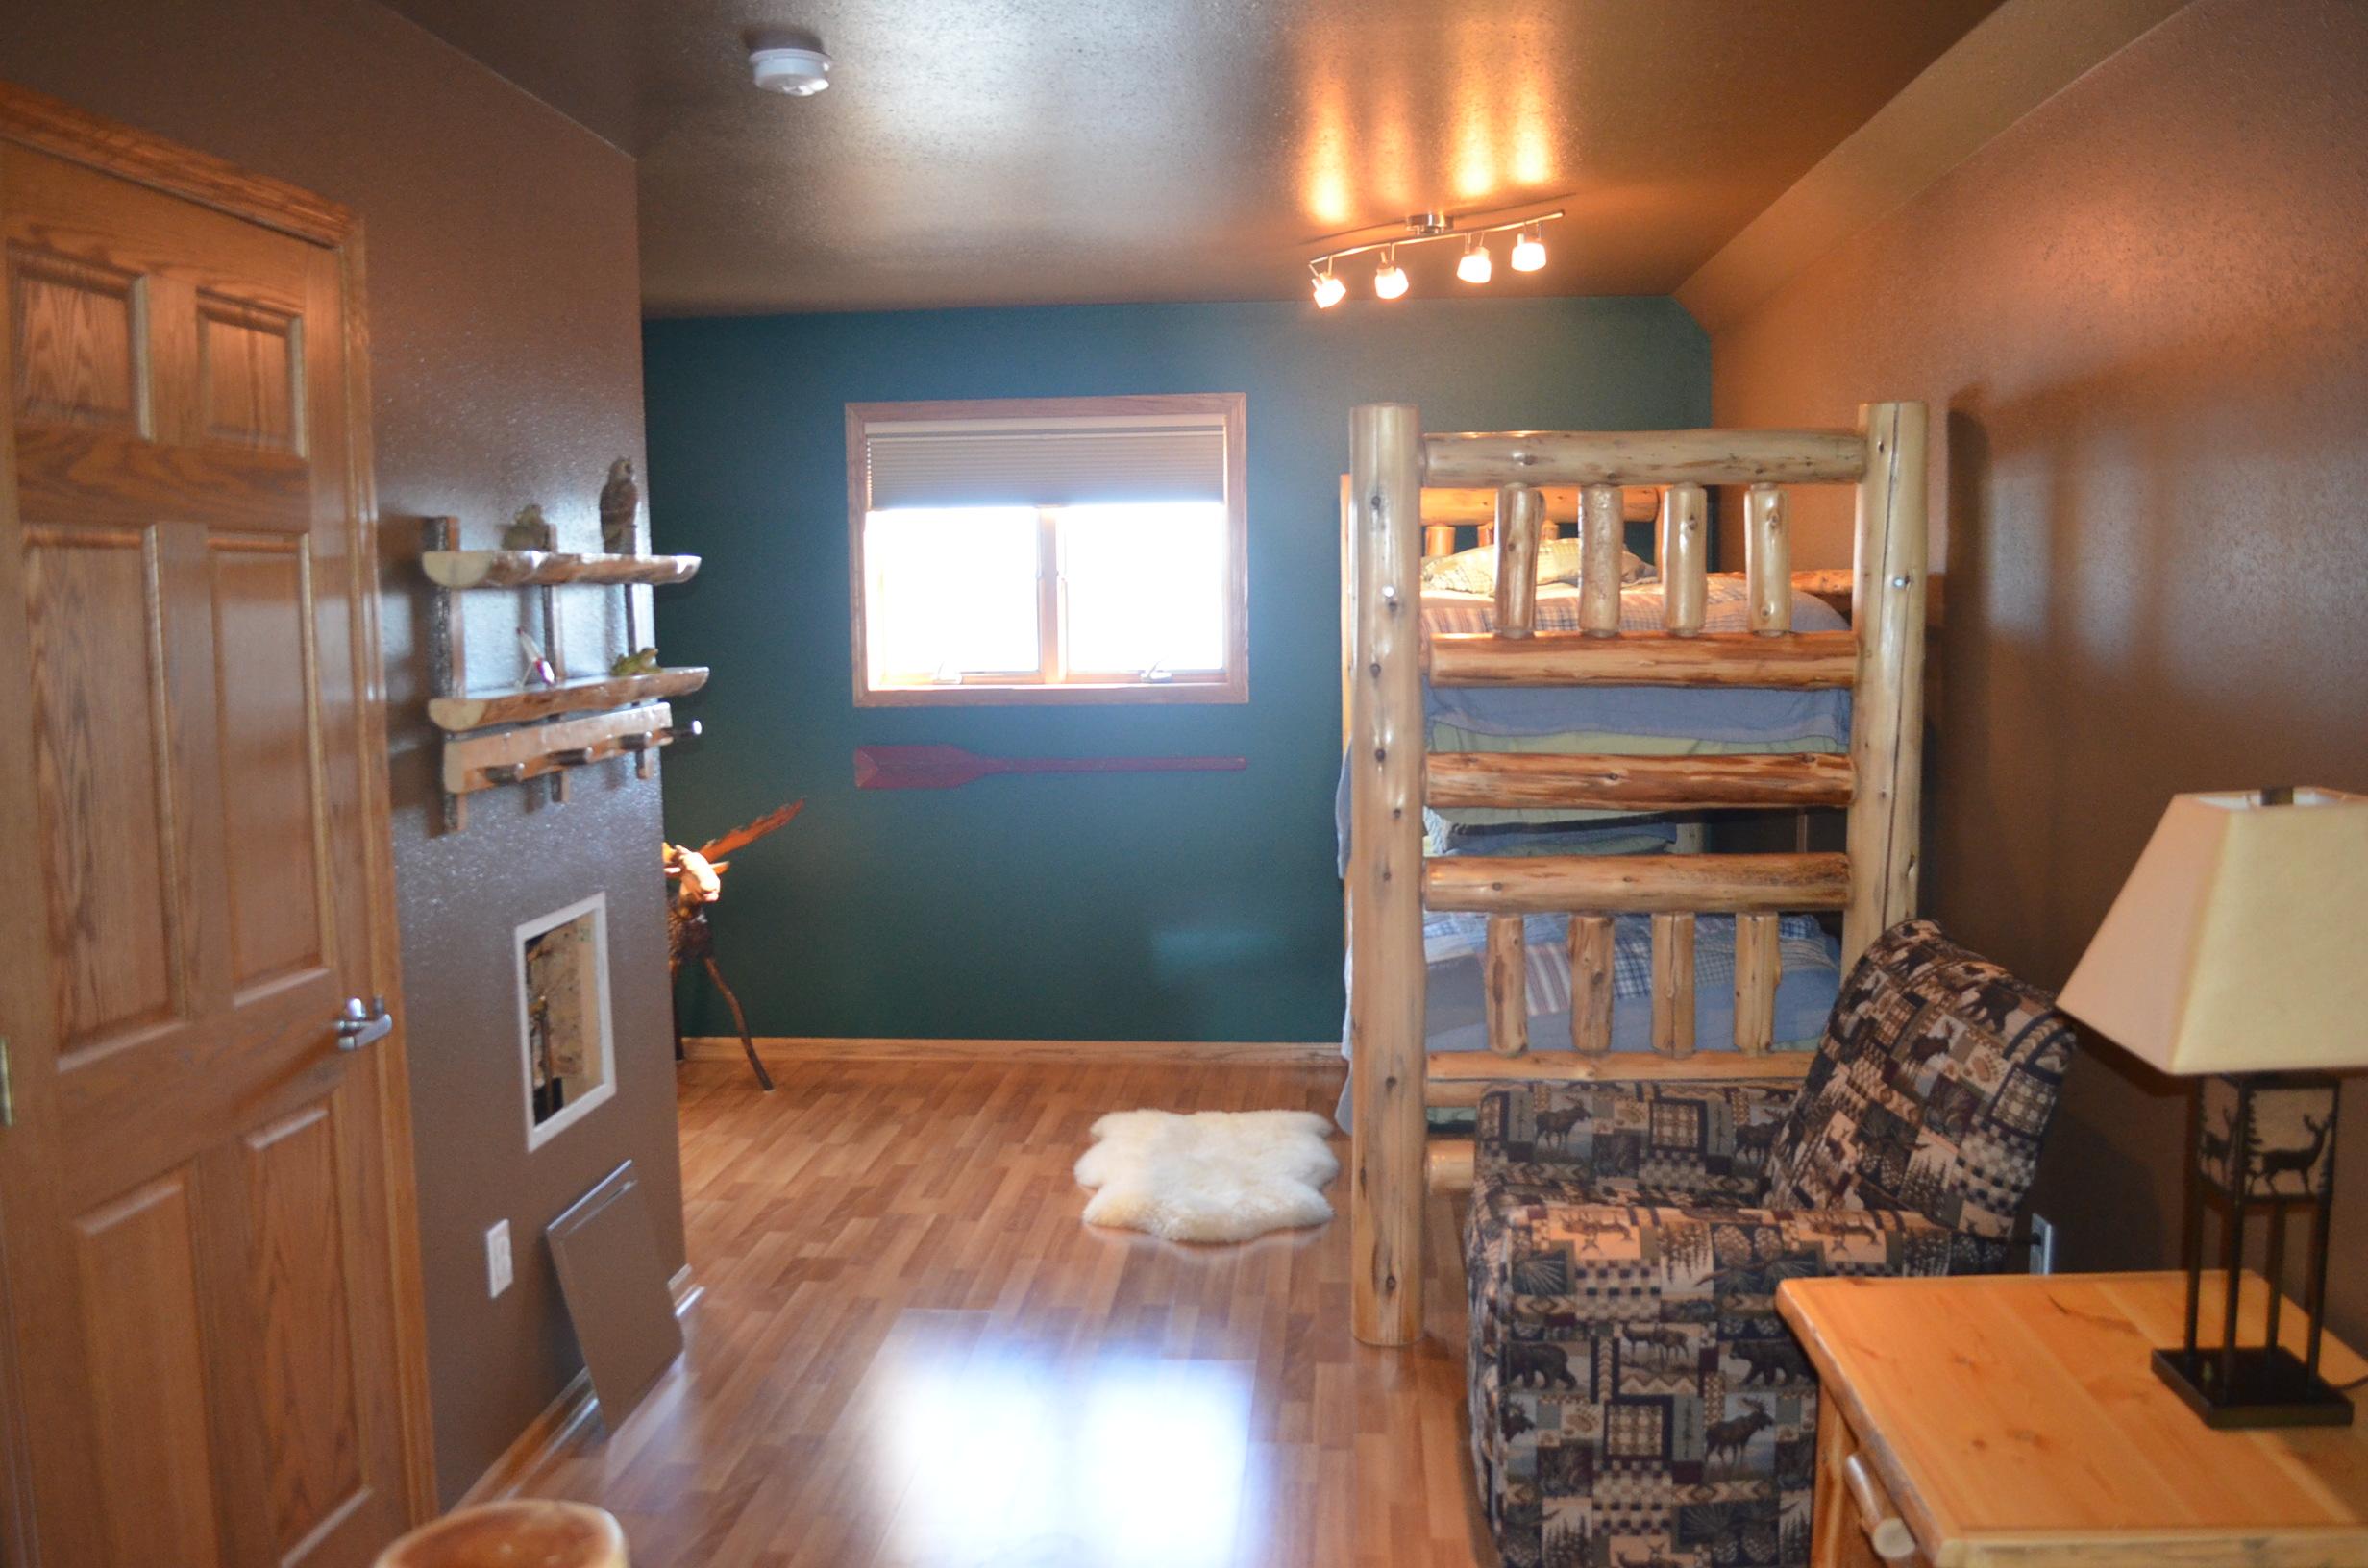 4 Bedrooms, Lake, For Sale, Sunset Bay Road, 4 Bathrooms, Listing ID 1131, Bottineau, Bottineau, North Dakota, United States, 58318,